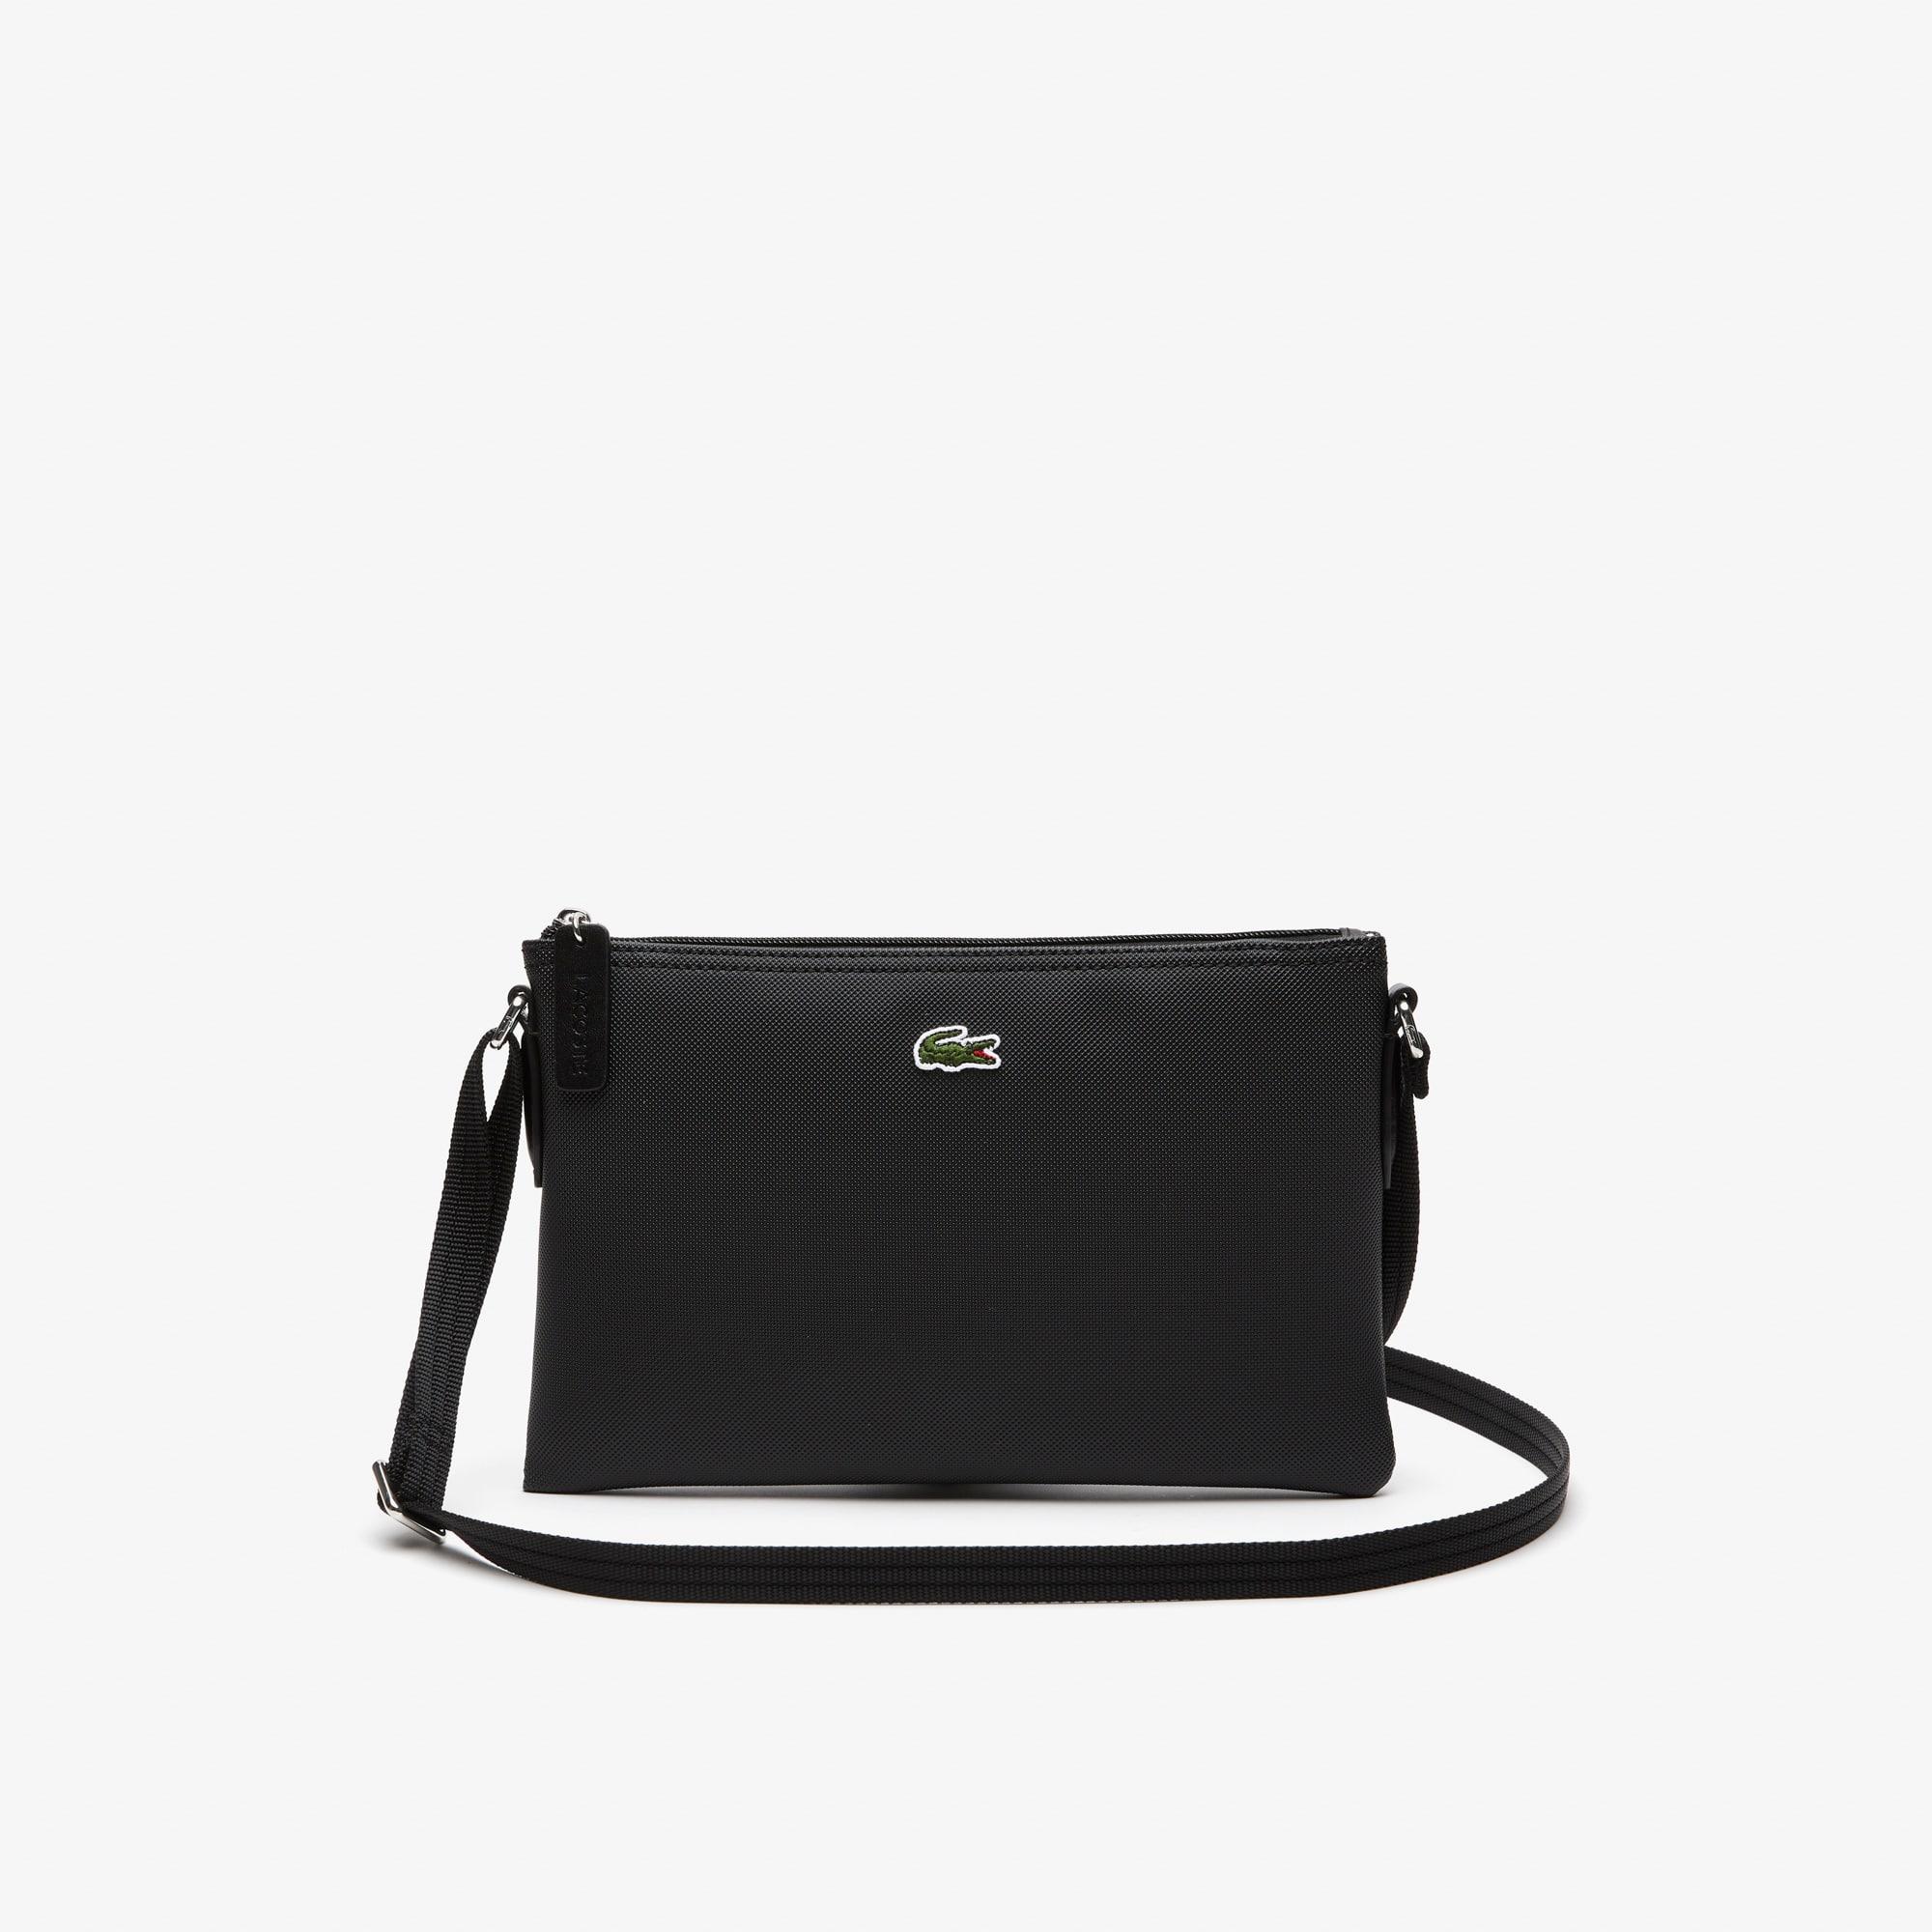 Women's L.12.12 Concept Flat Crossover Bag